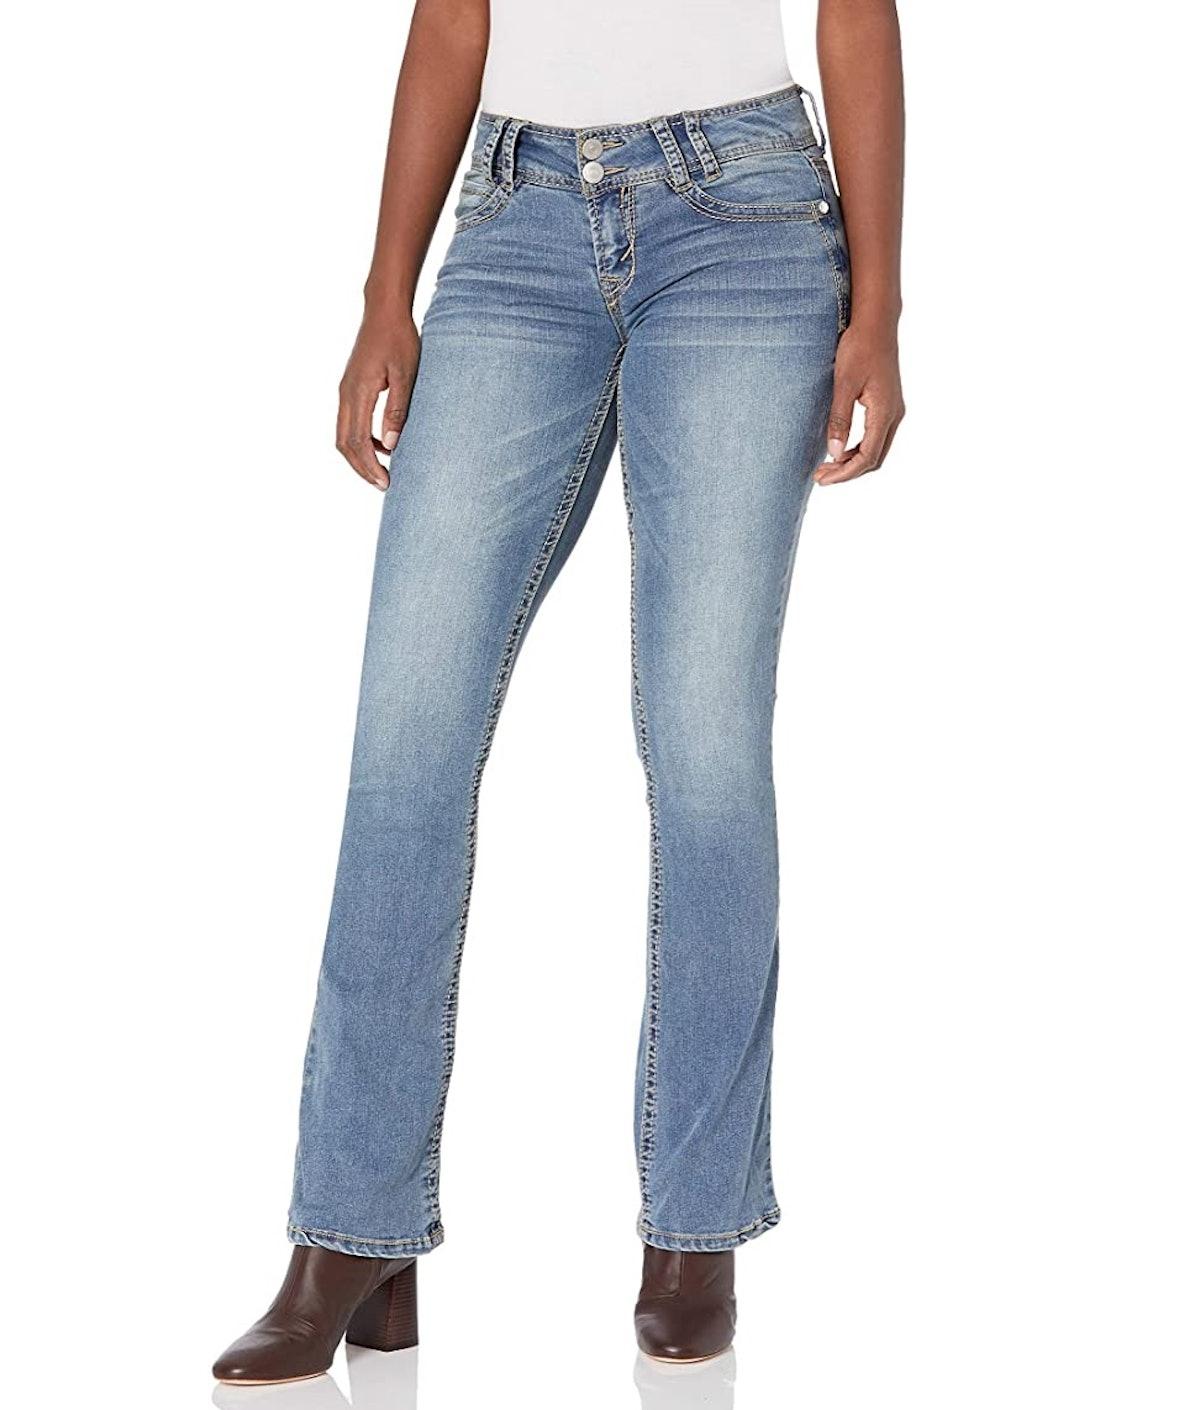 WallFlower Instastretch Bootcut Jeans